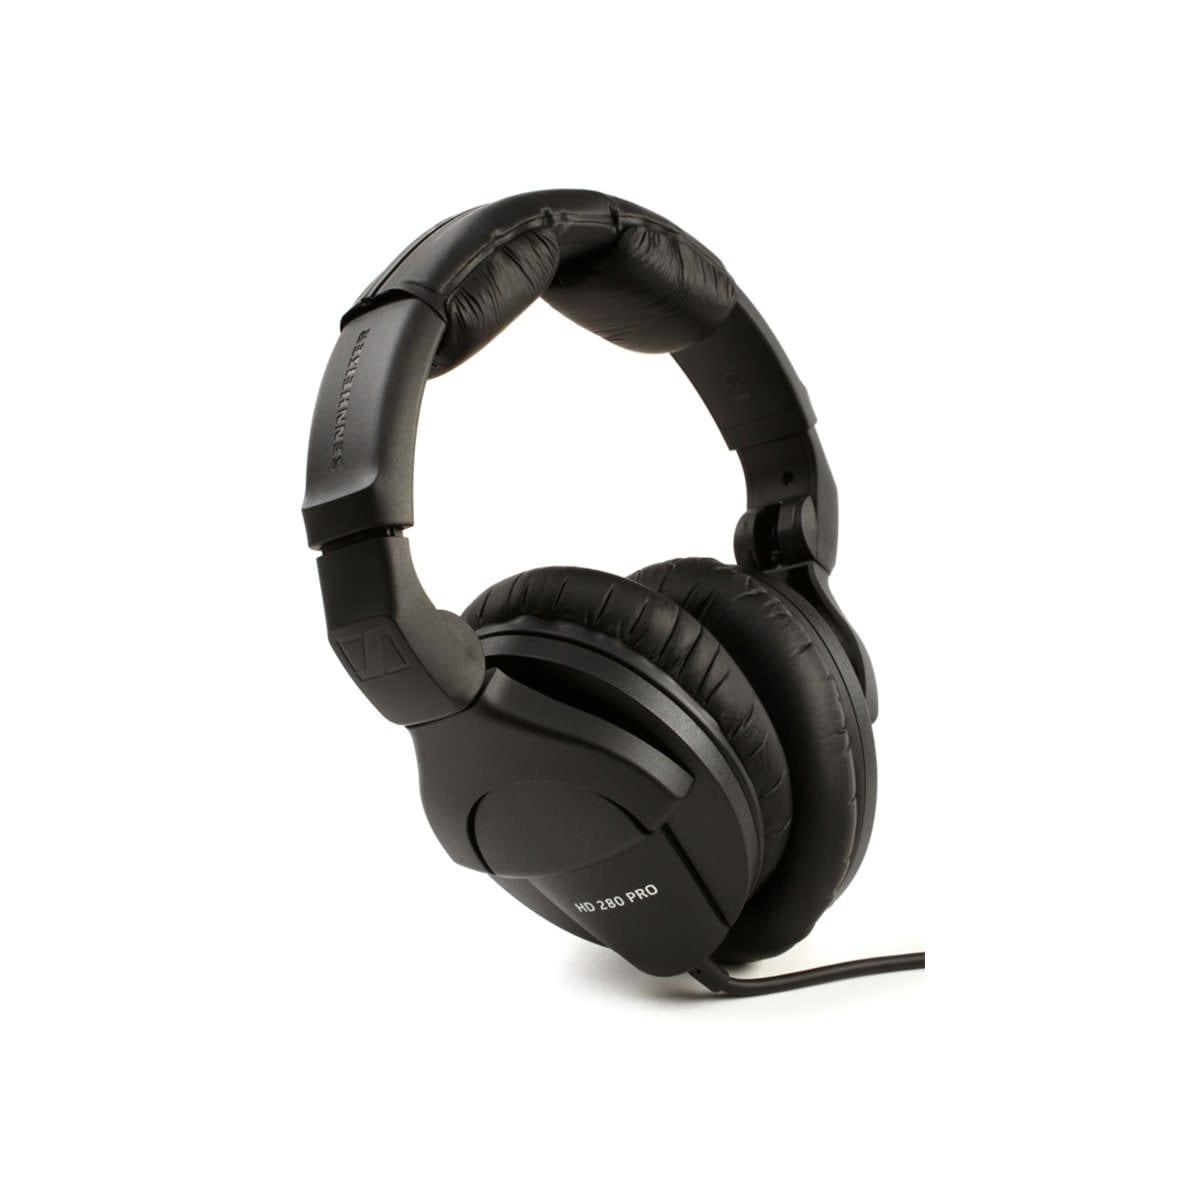 Sennheiser HD 280 Pro Headphones